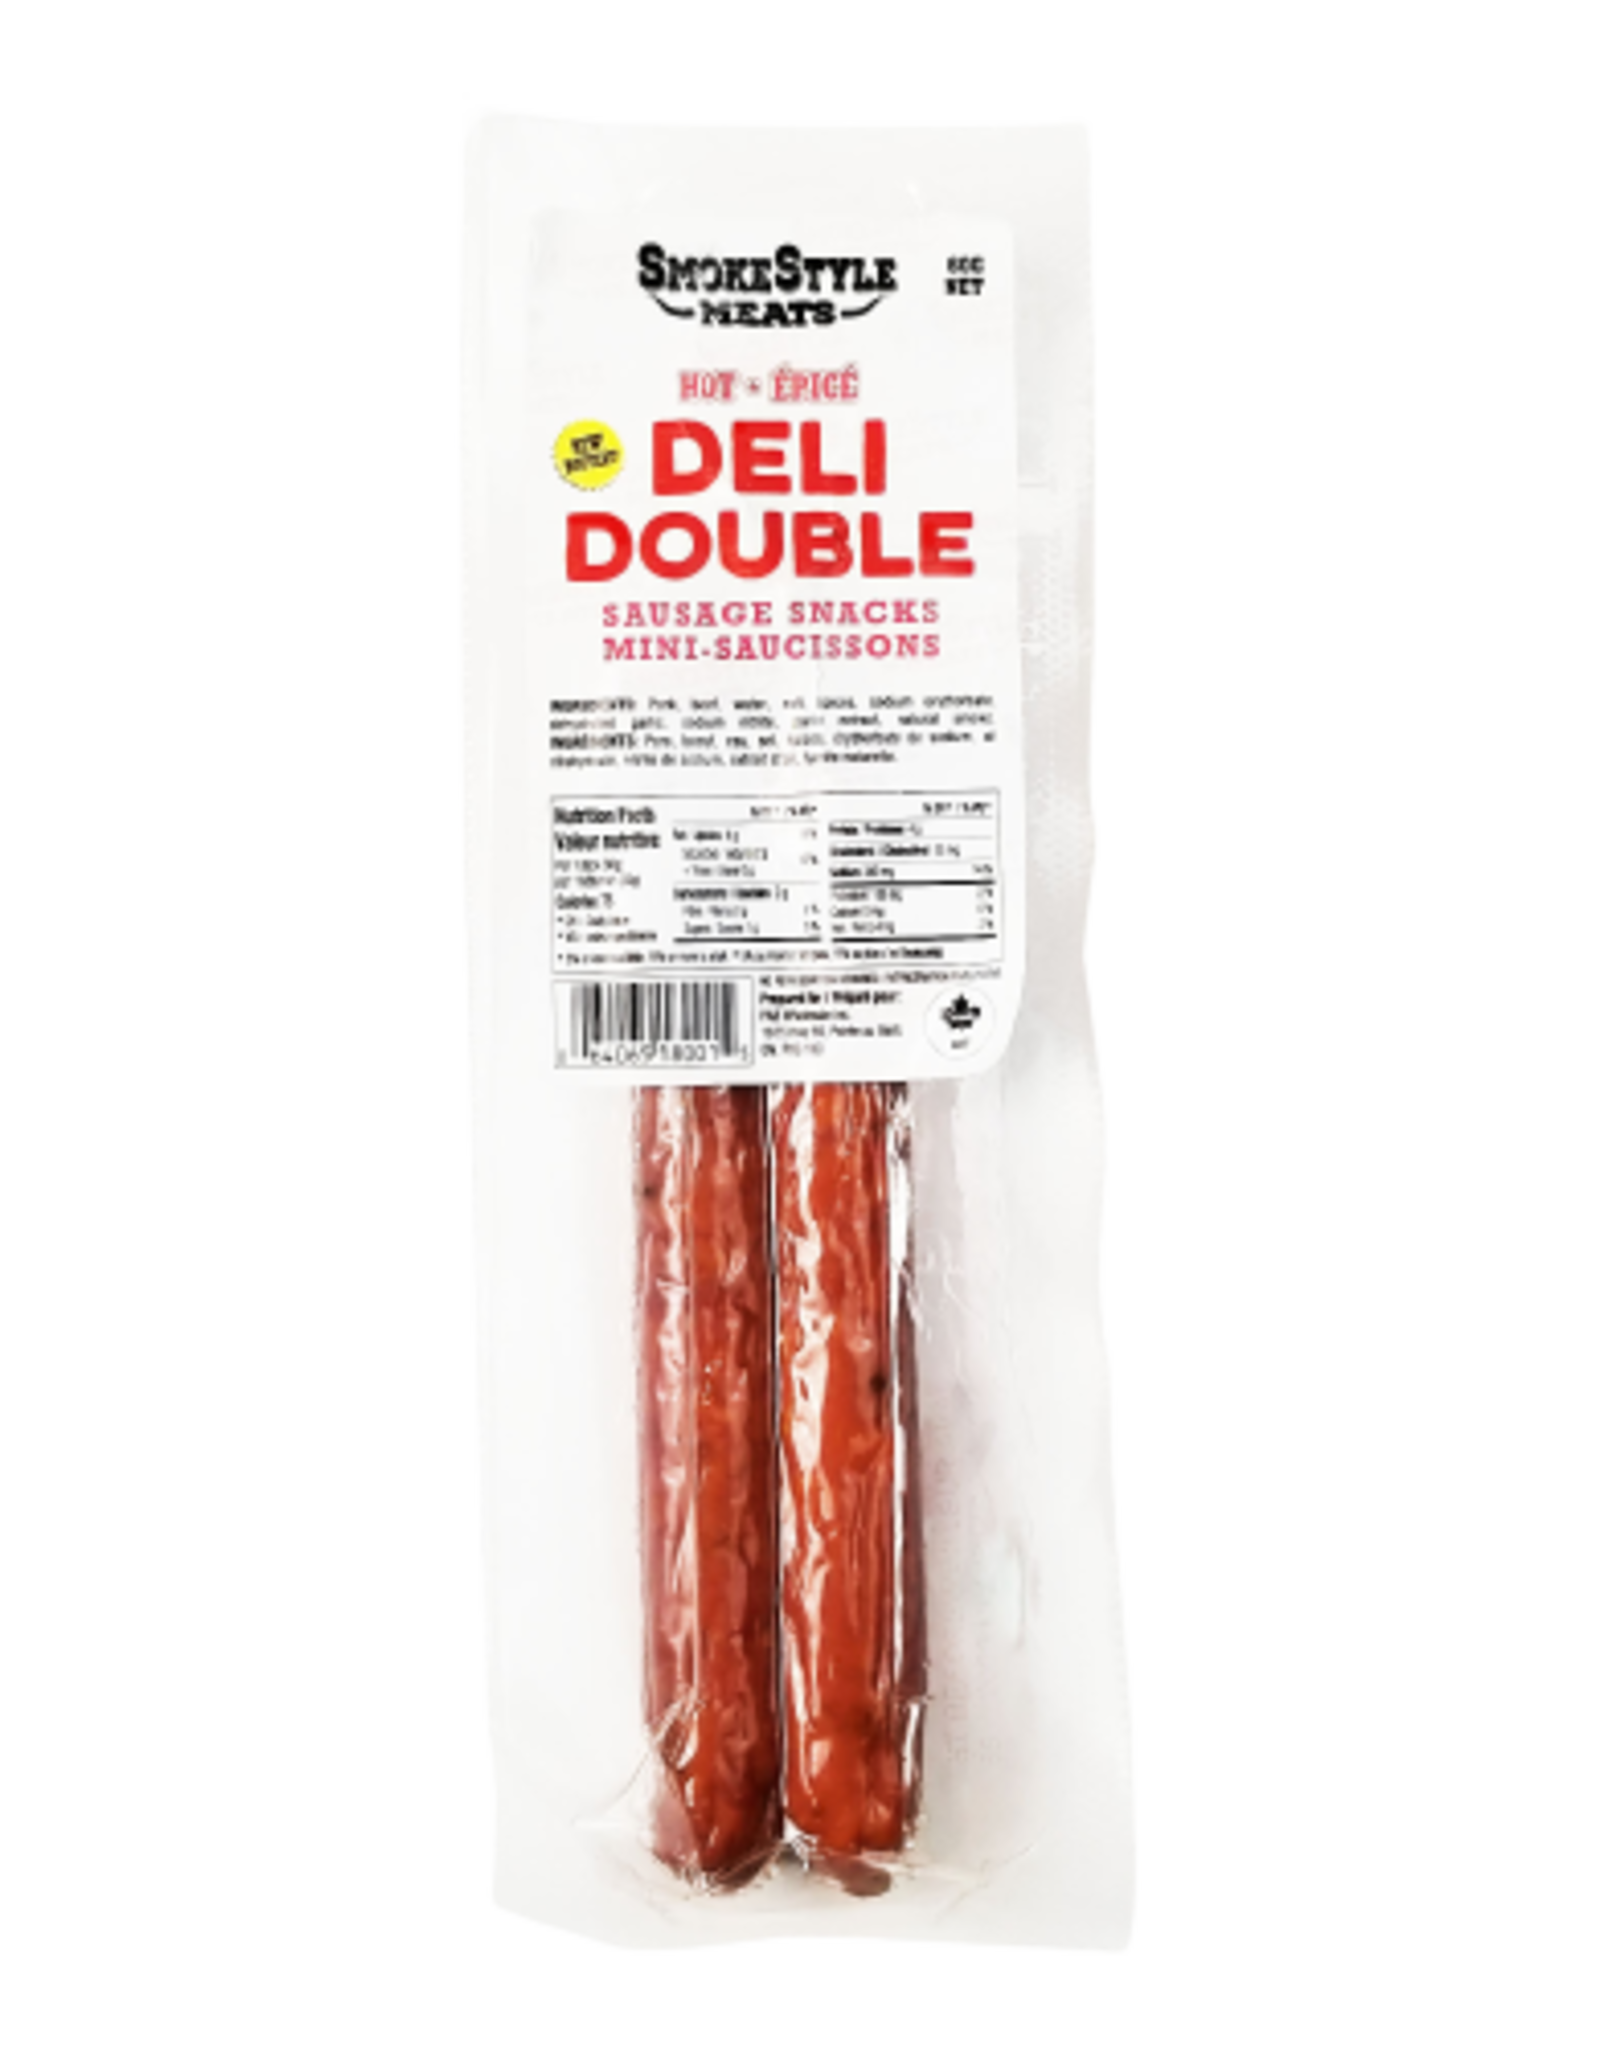 SmokeStyle Deli Double Hot